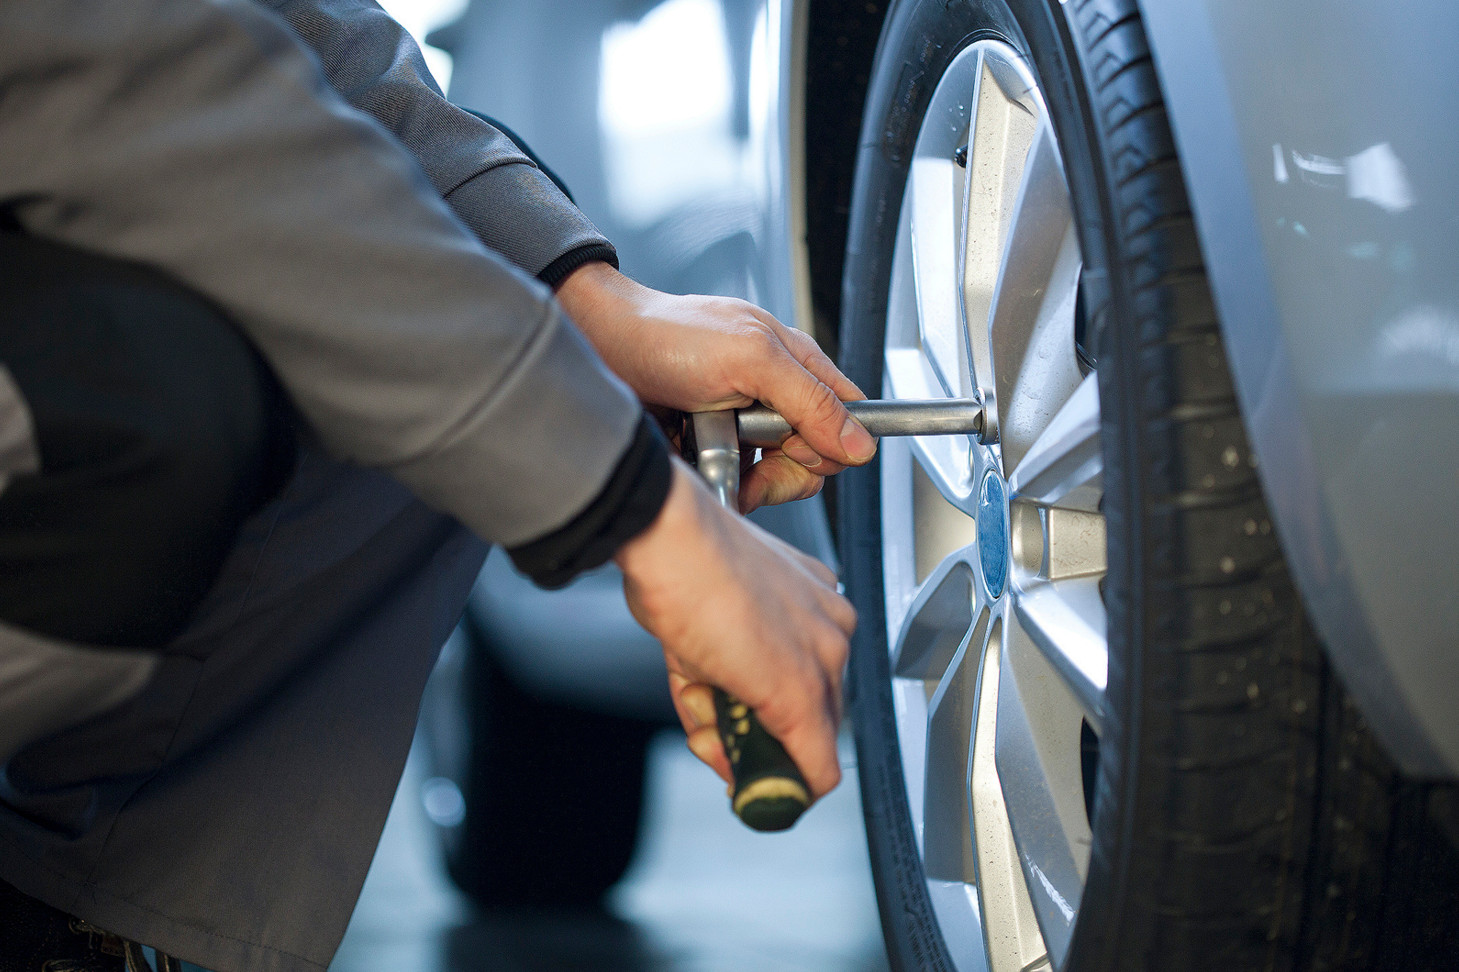 Замена колеса на дороге